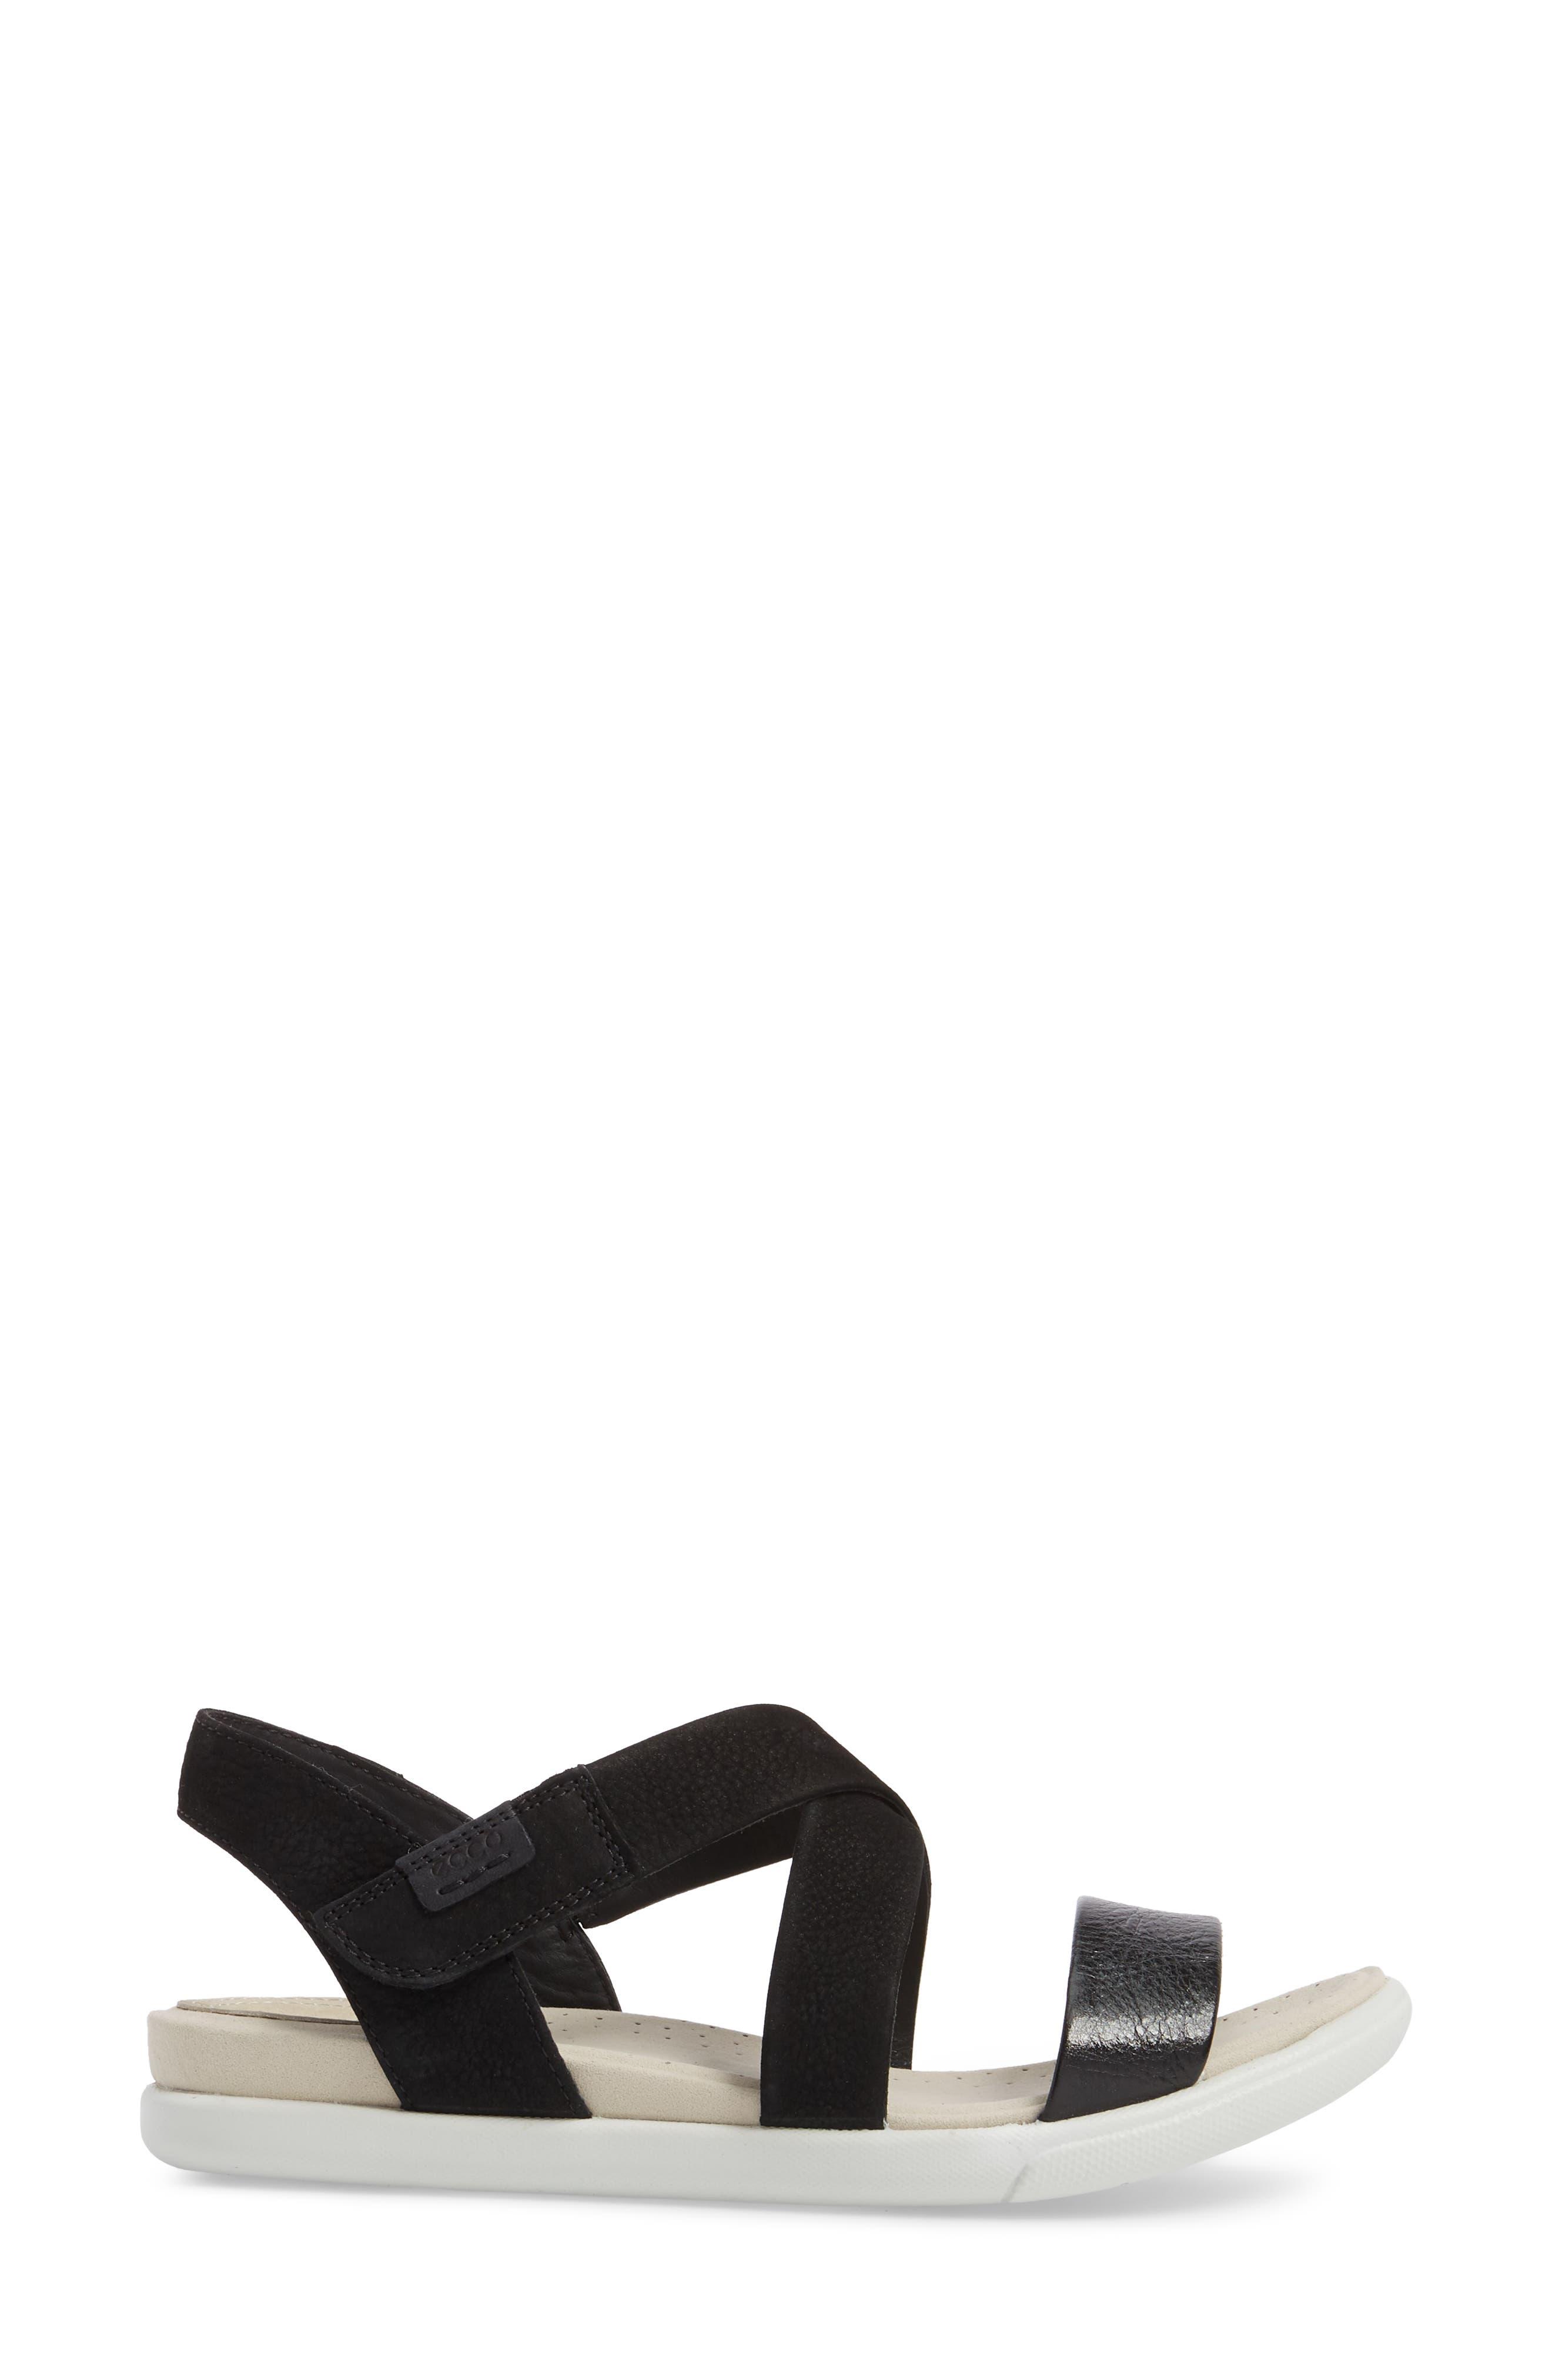 Damara Cross-Strap Sandal,                             Alternate thumbnail 3, color,                             Black Leather